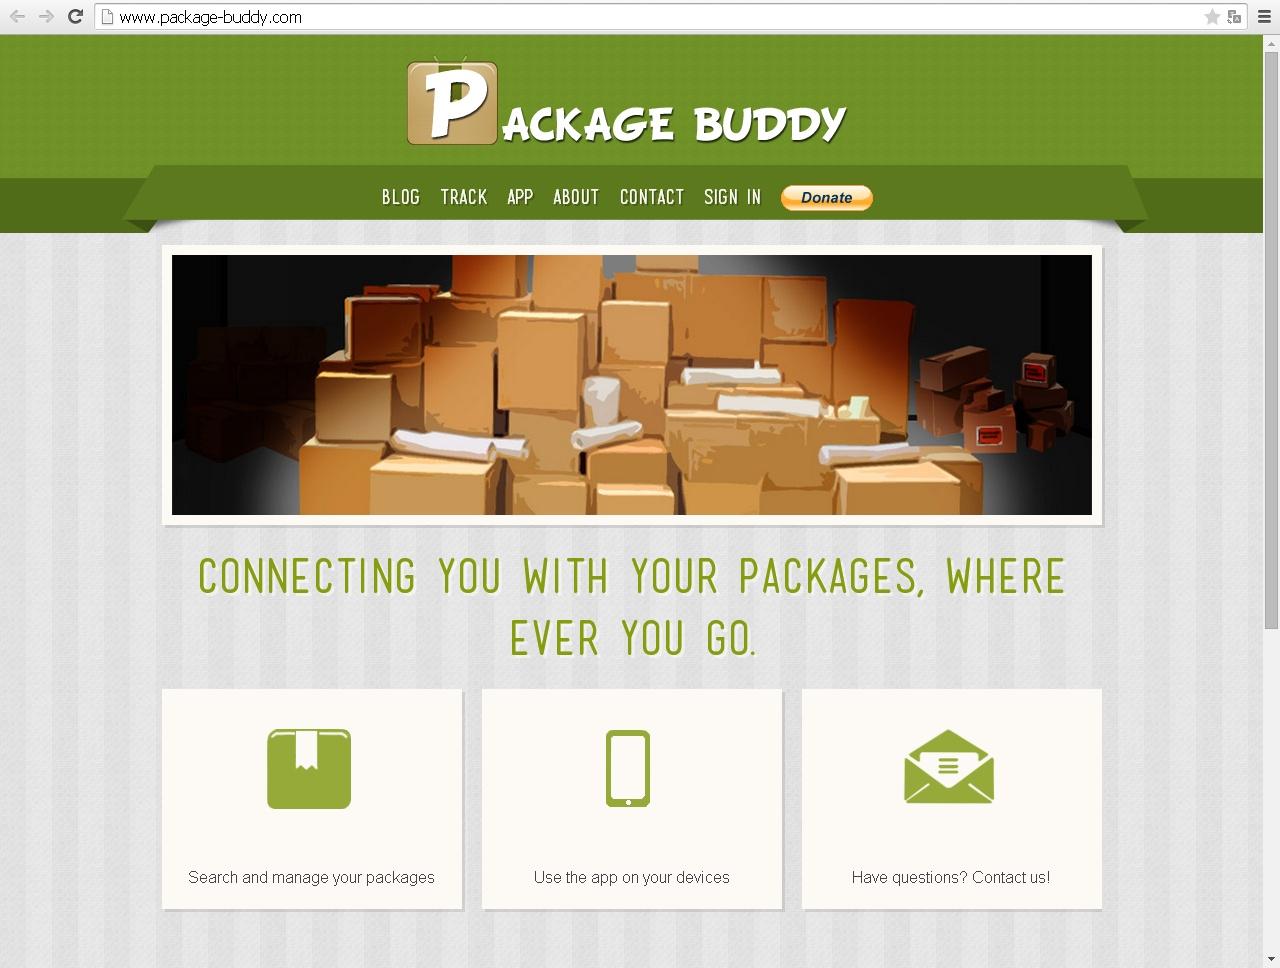 packagebuddy